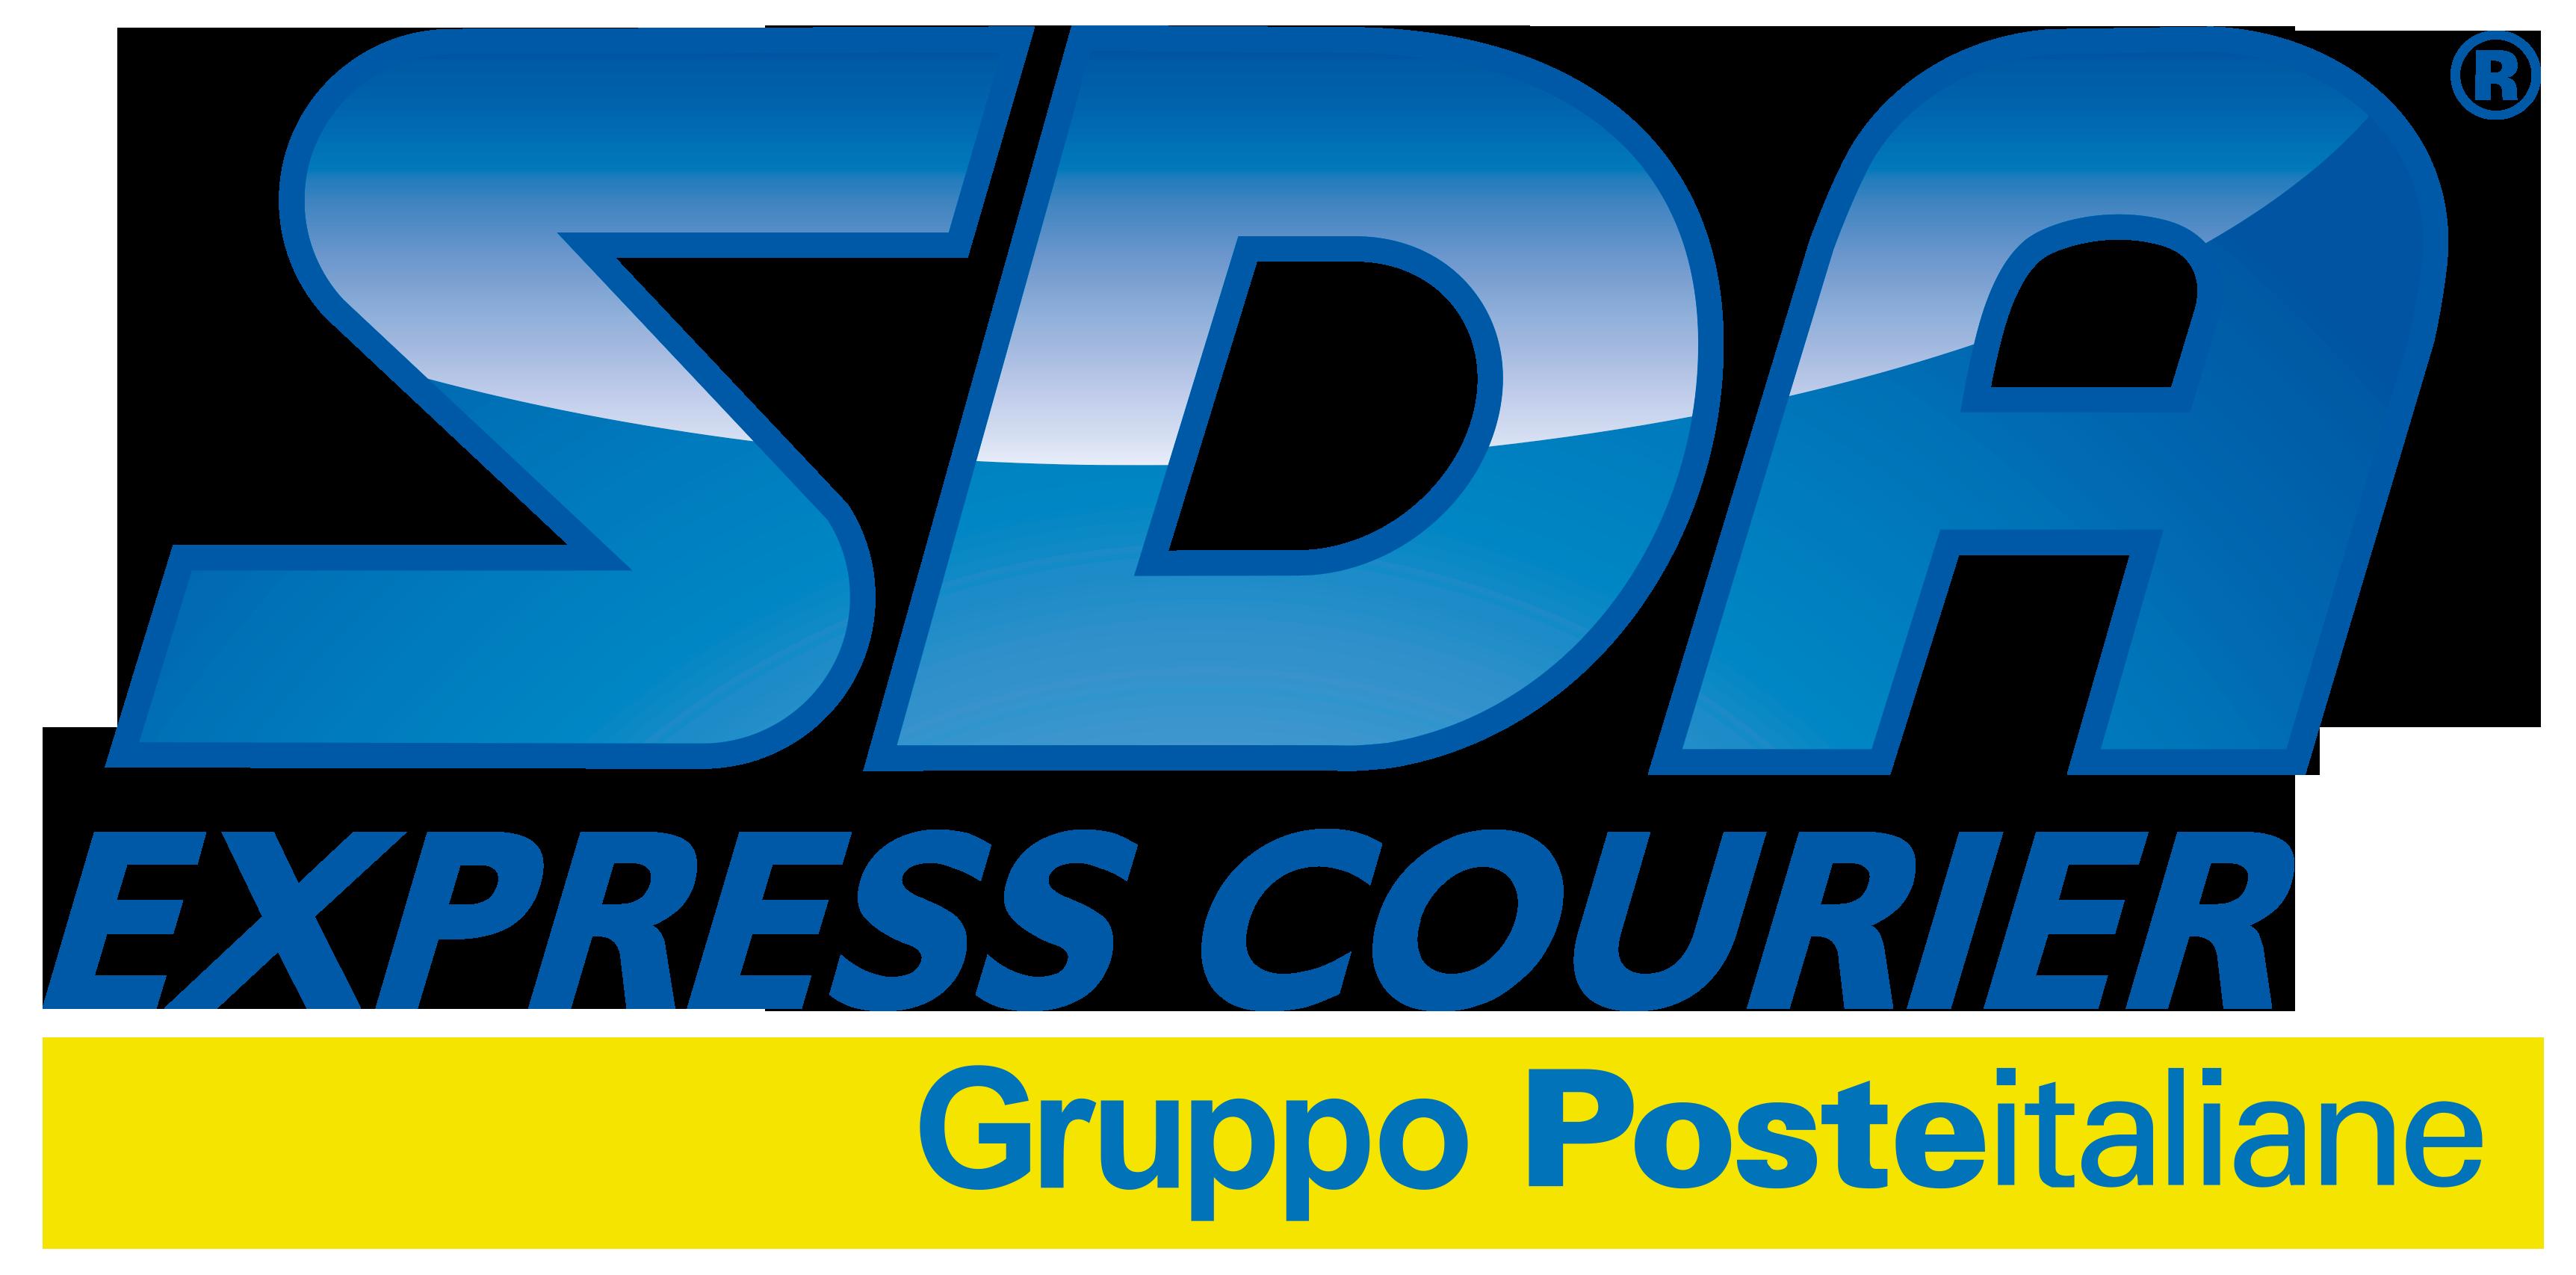 corriere espresso maiuolo express amp services affiliato